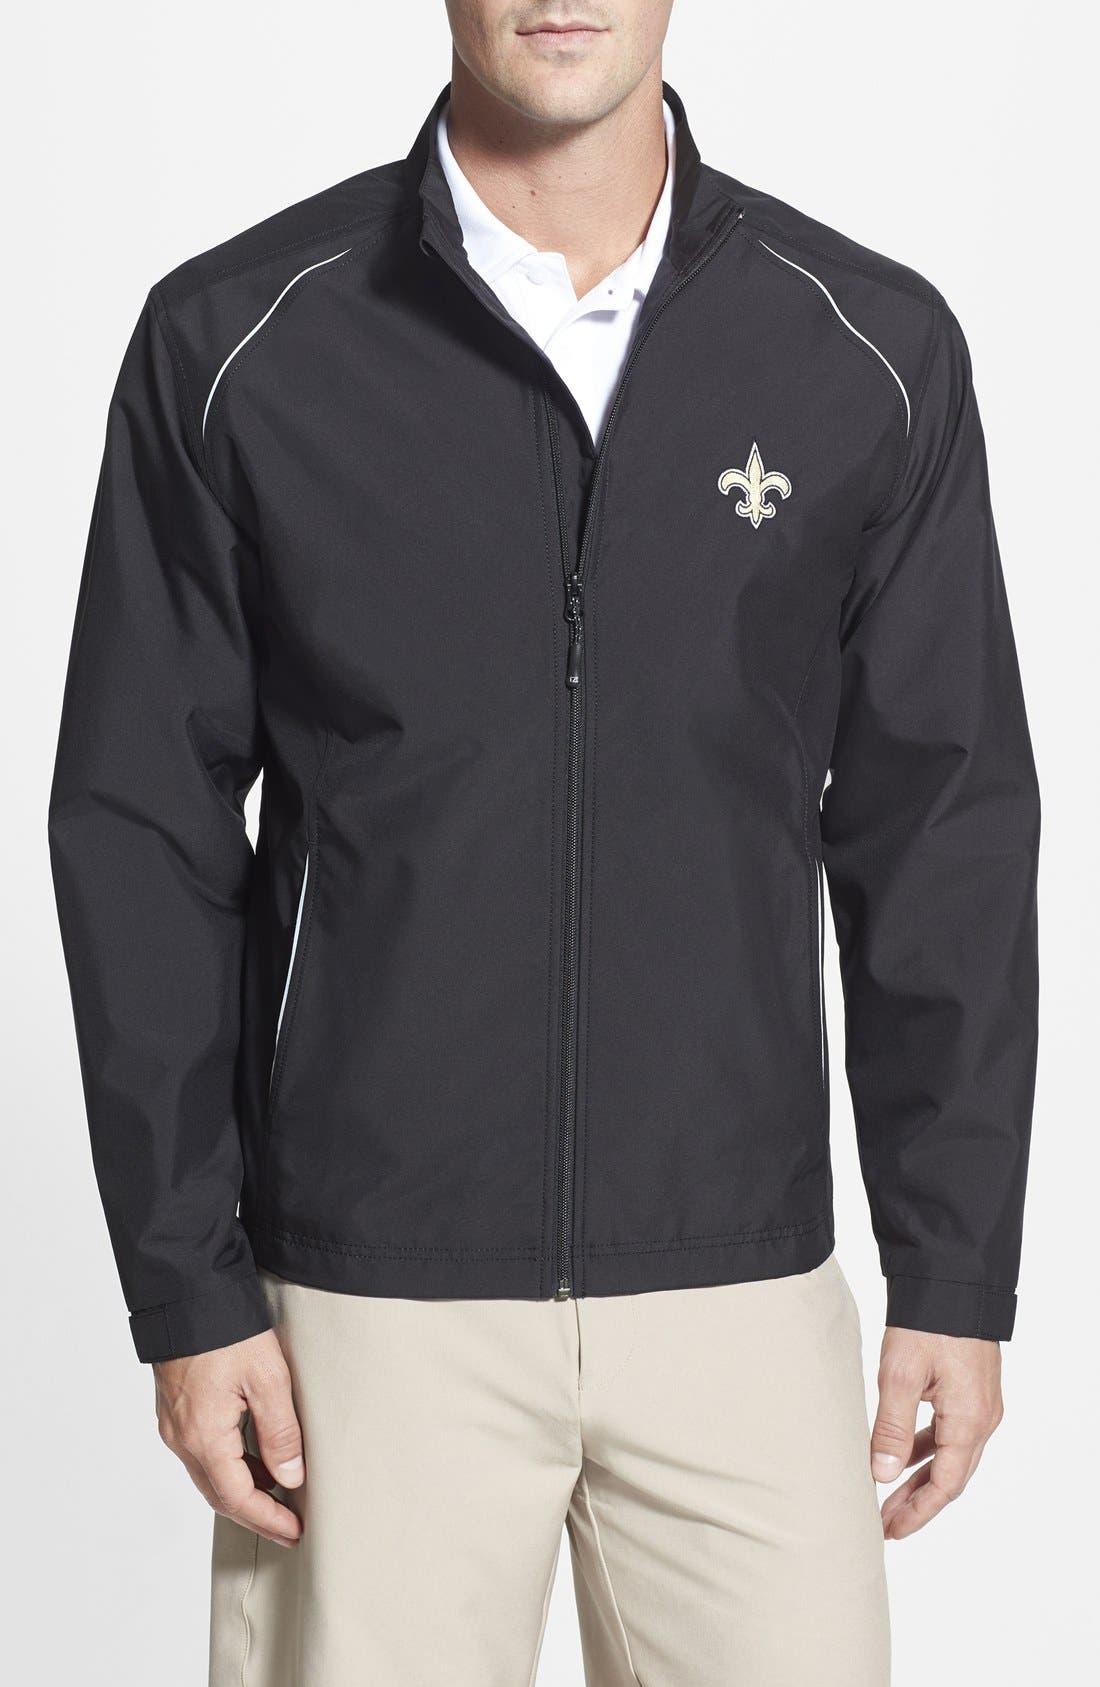 Main Image - Cutter & Buck New Orleans Saints - Beacon WeatherTec Wind & Water Resistant Jacket